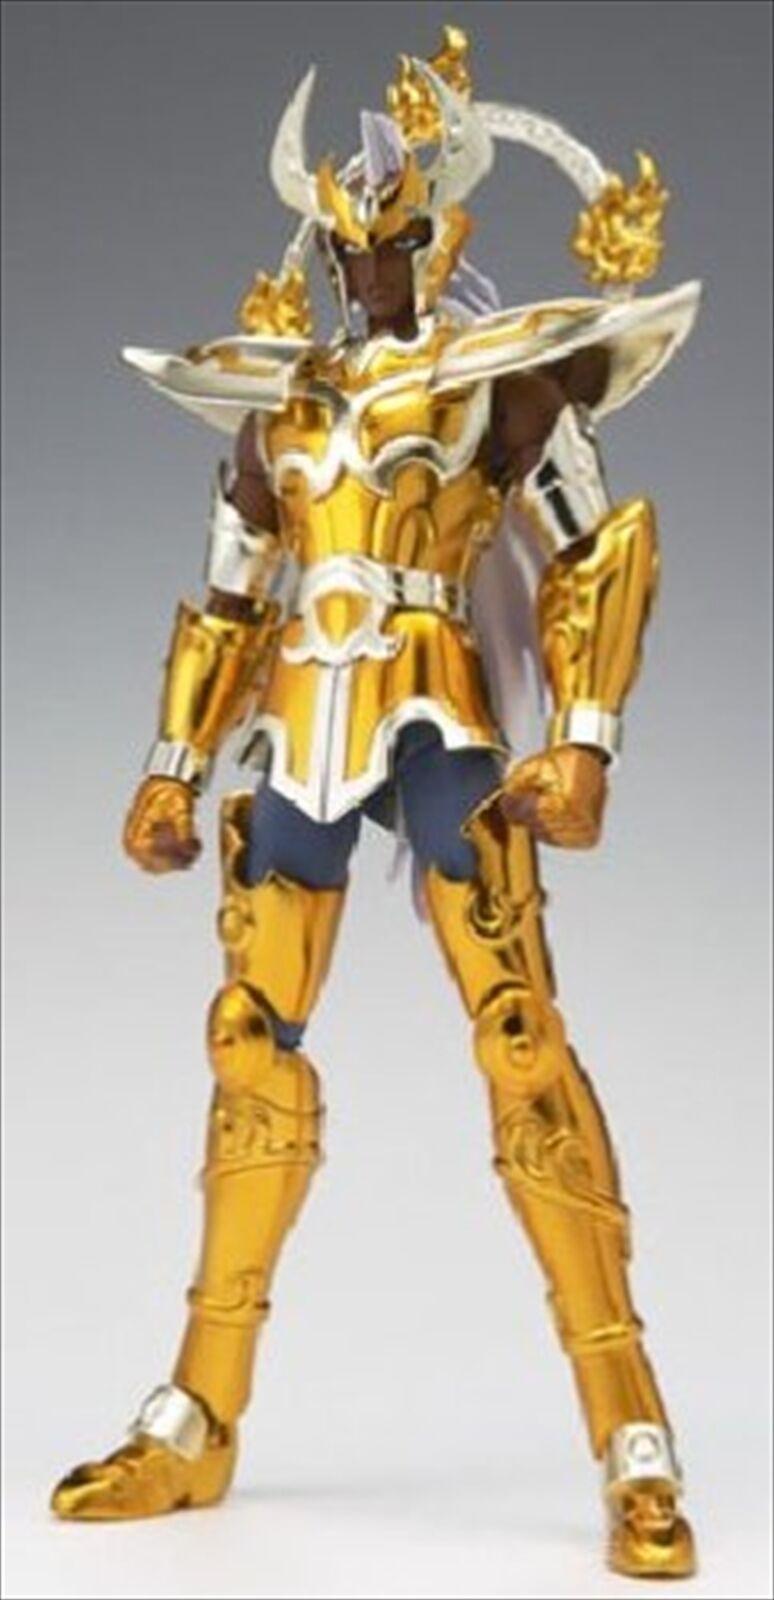 Bandai Saint Seiya Cloth Myth Poseidon Chrysaor Krishna Action Figure